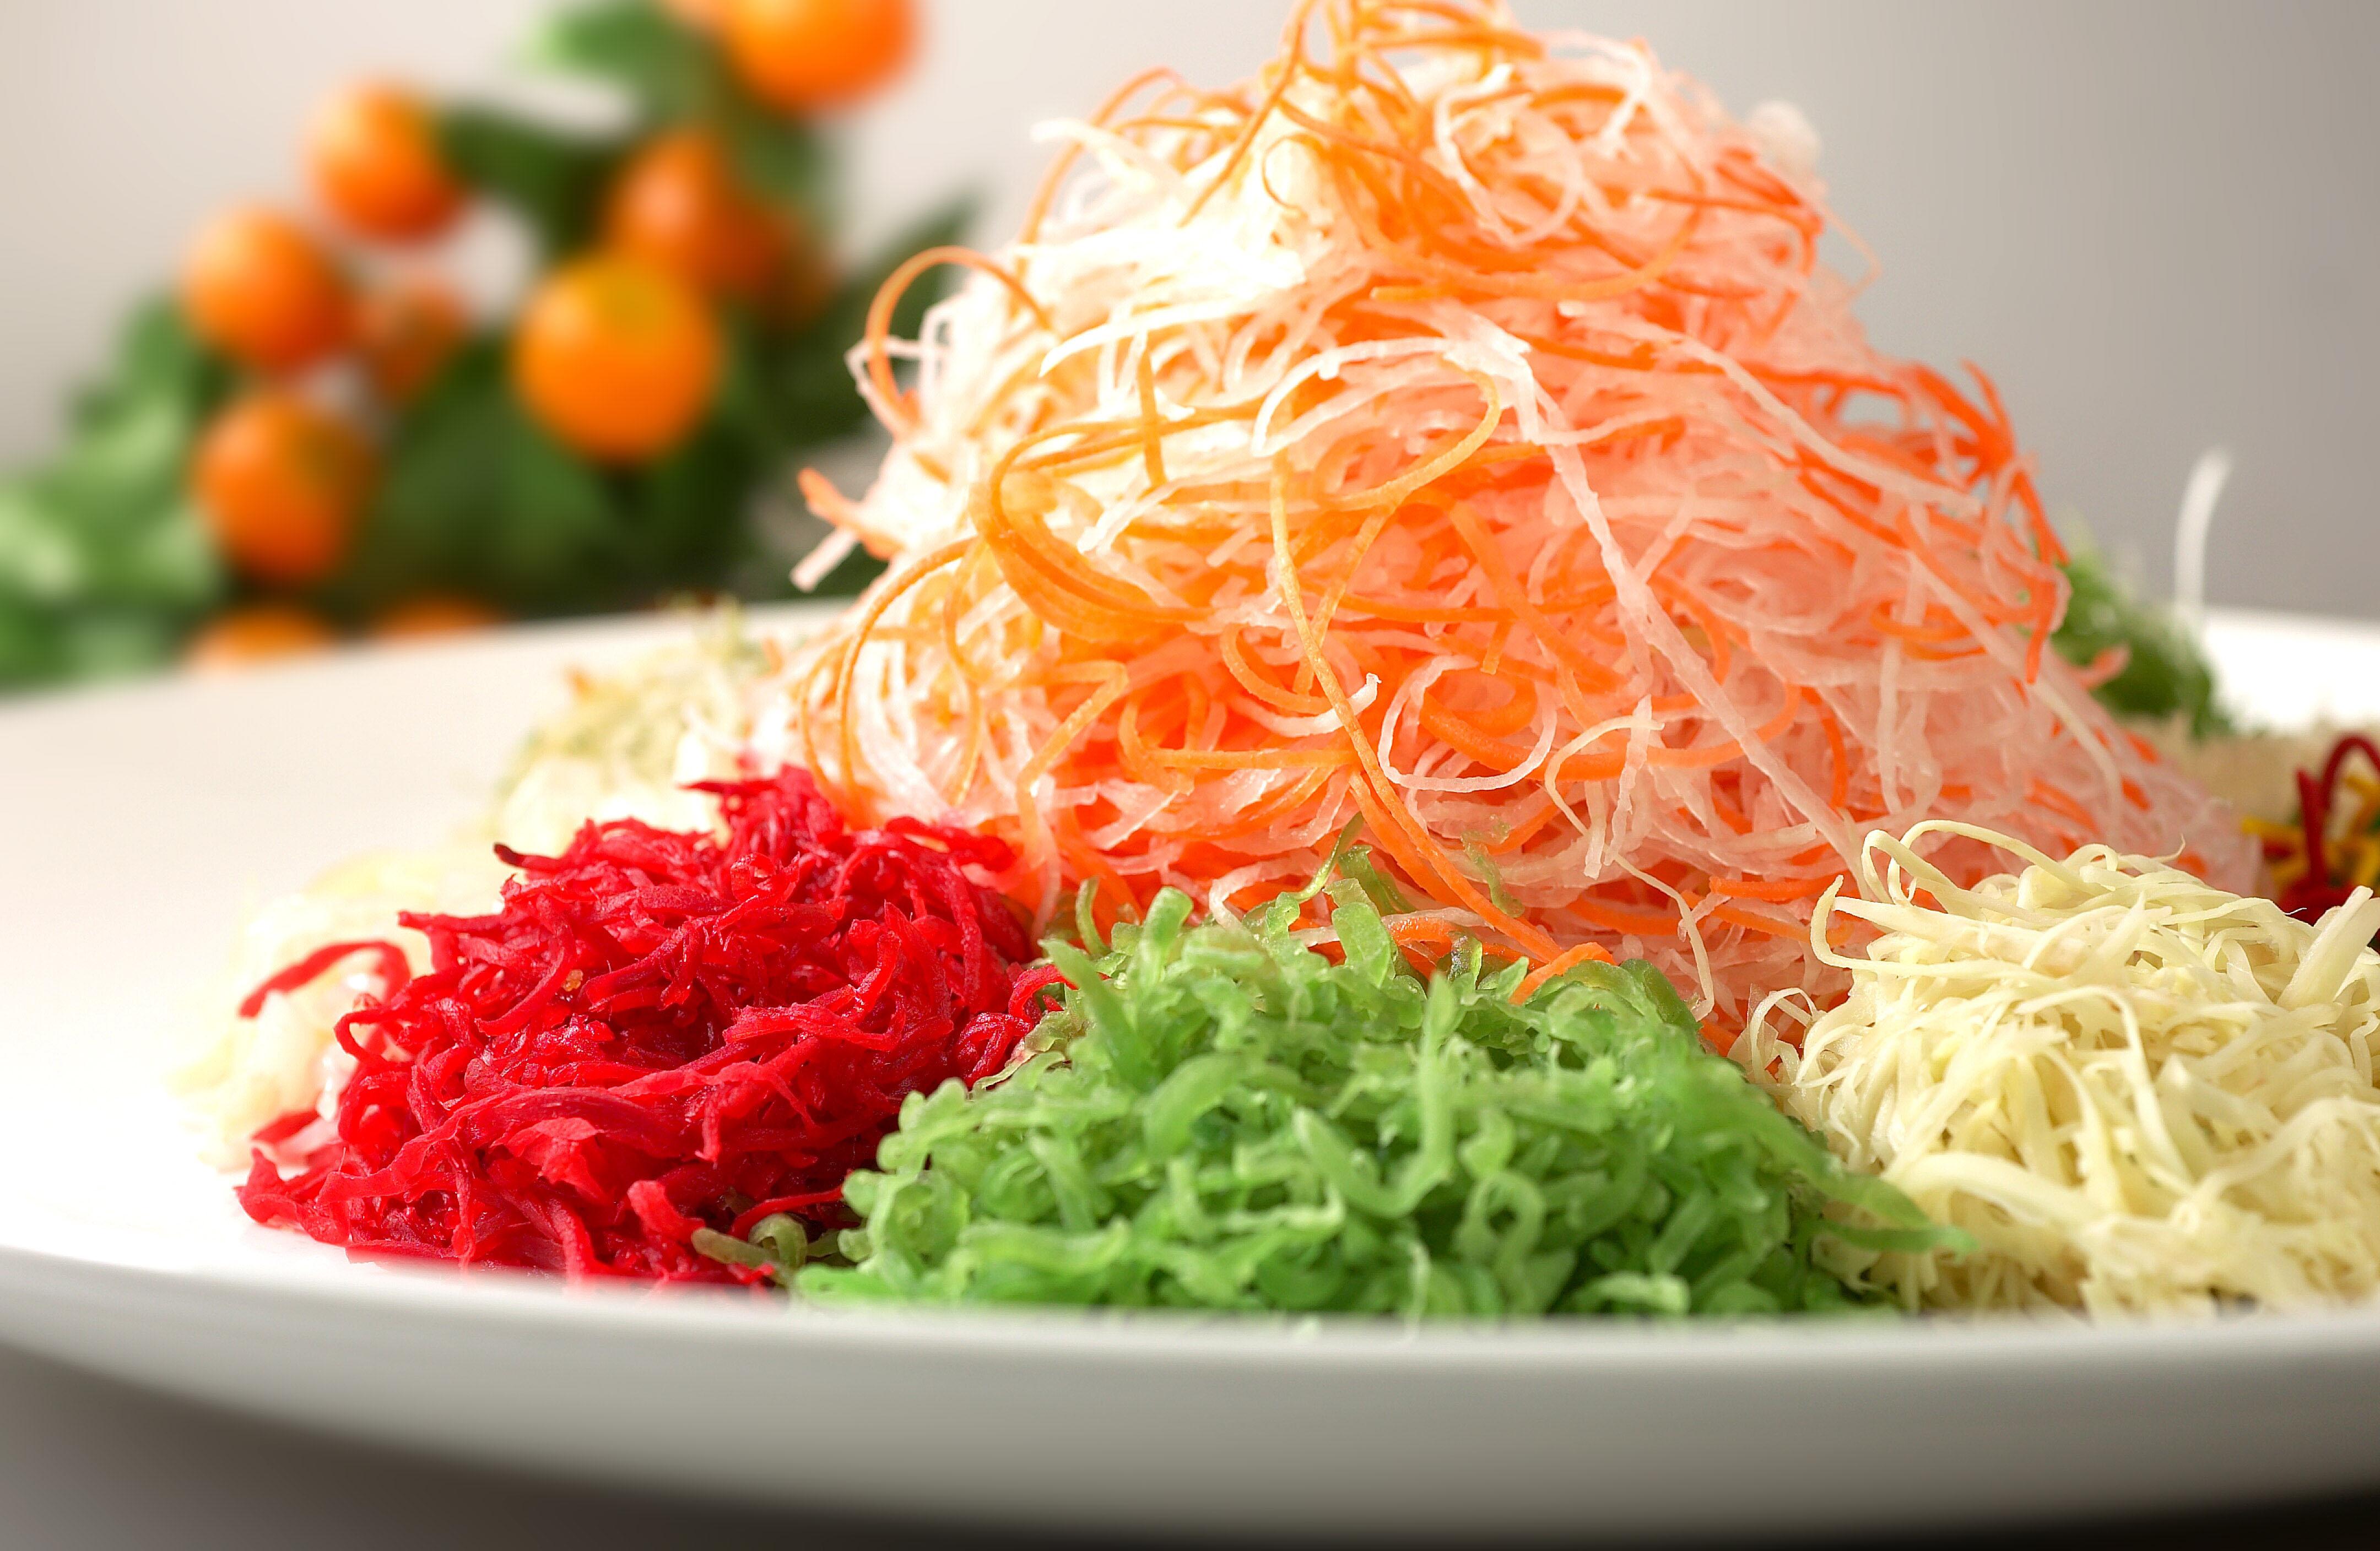 Sheraton Saigon - ẩm thực Tết sepecial menu - elle vietnam 4